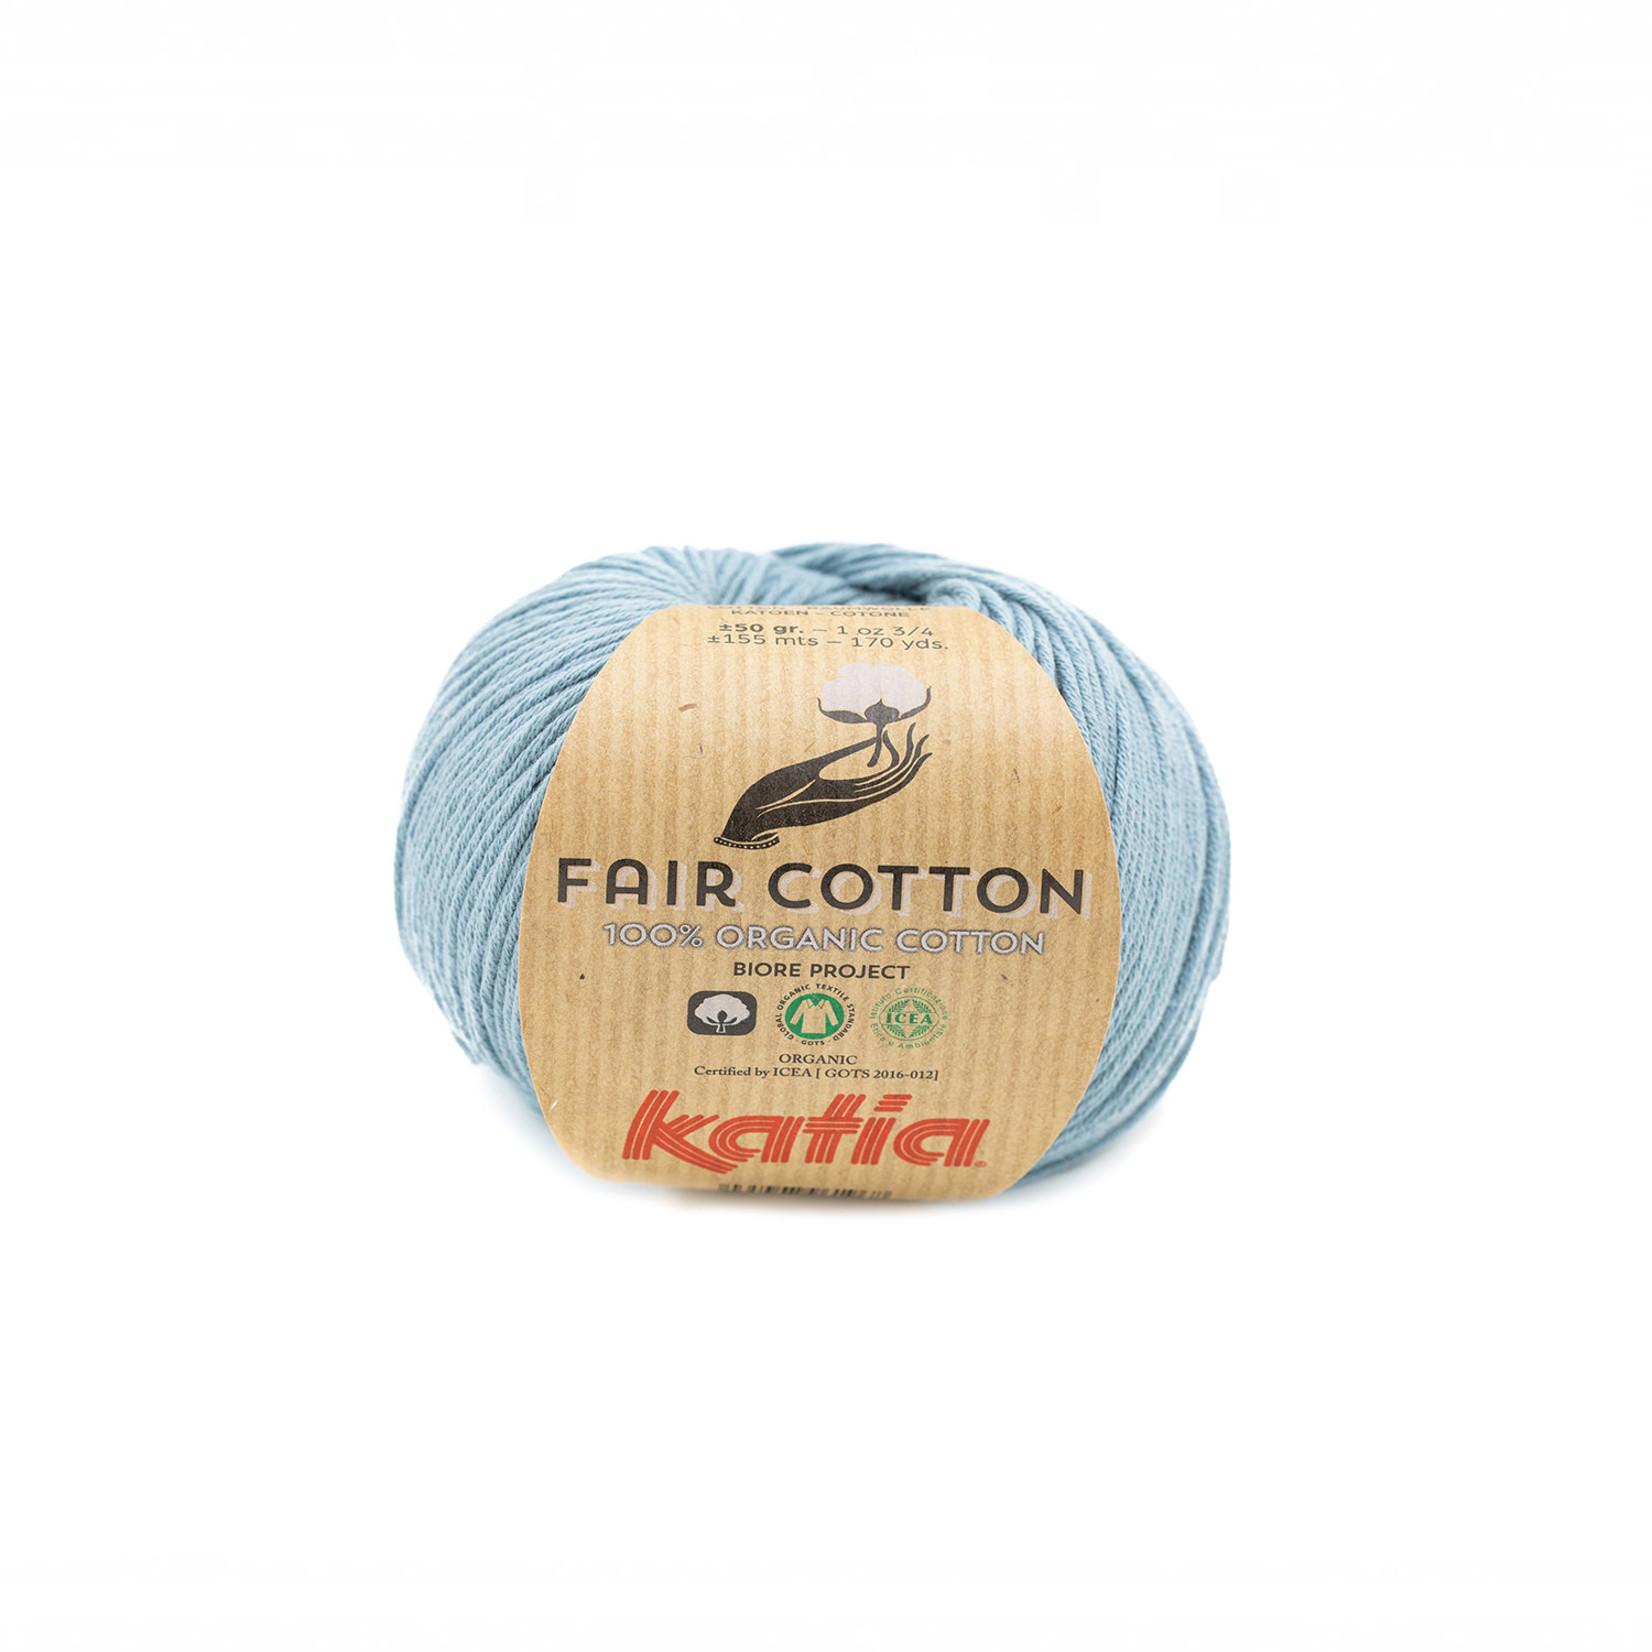 Katia Katia Fair Cotton 41 - grijsblauw - 1 bol = 50 gr. = 155 m. - 100% biol. katoen